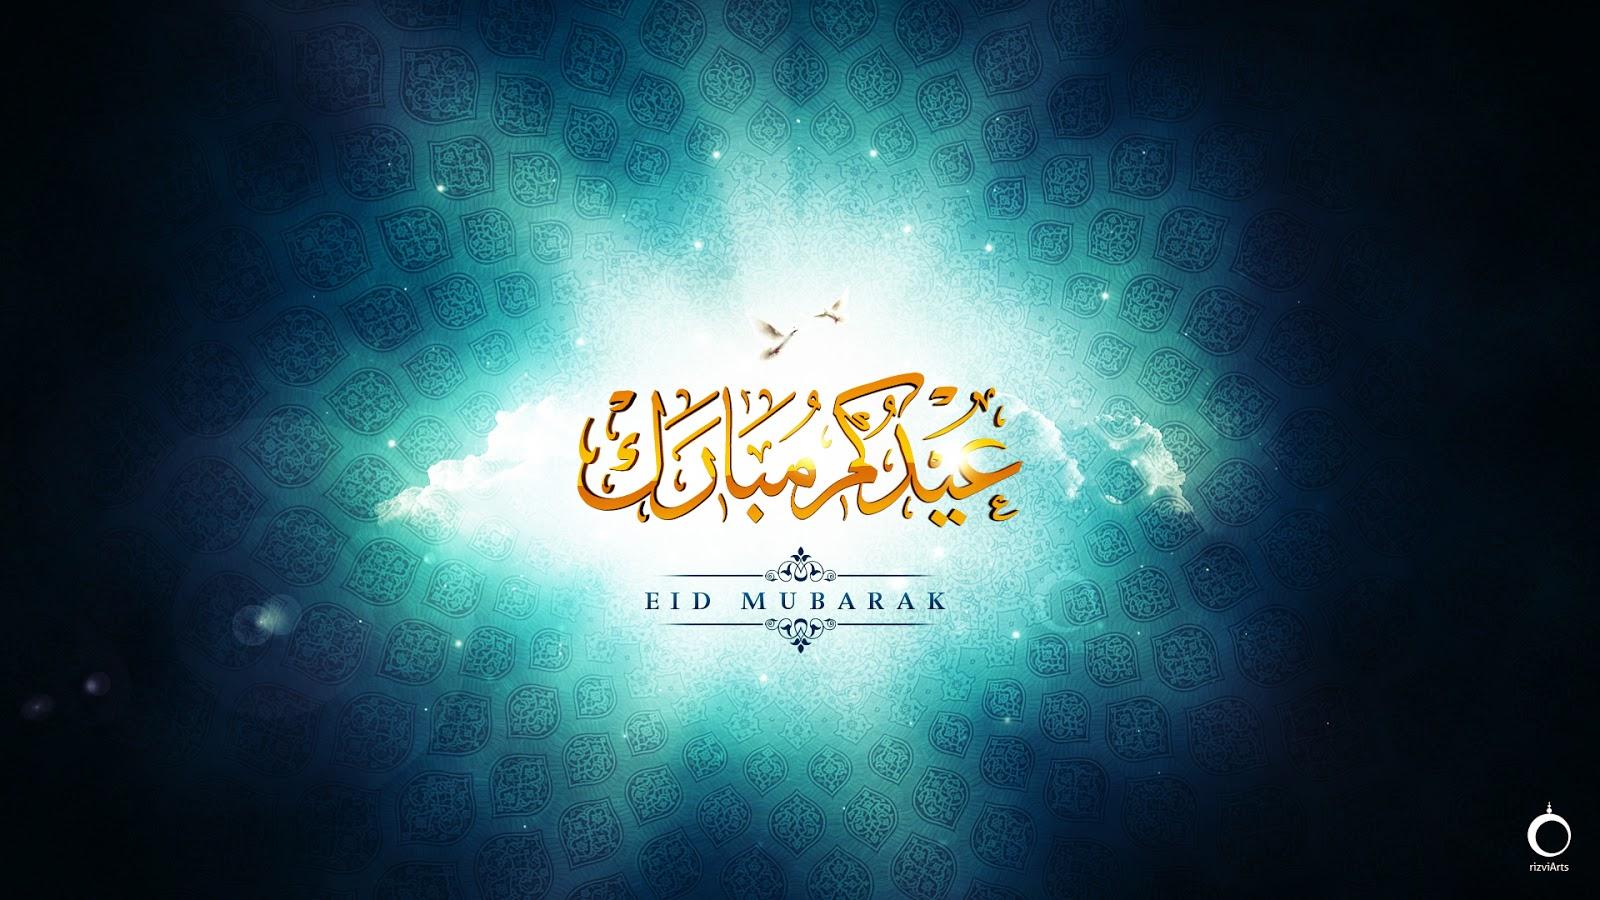 Selamat Hari Raya Idul Adha 2014 Wallpaper